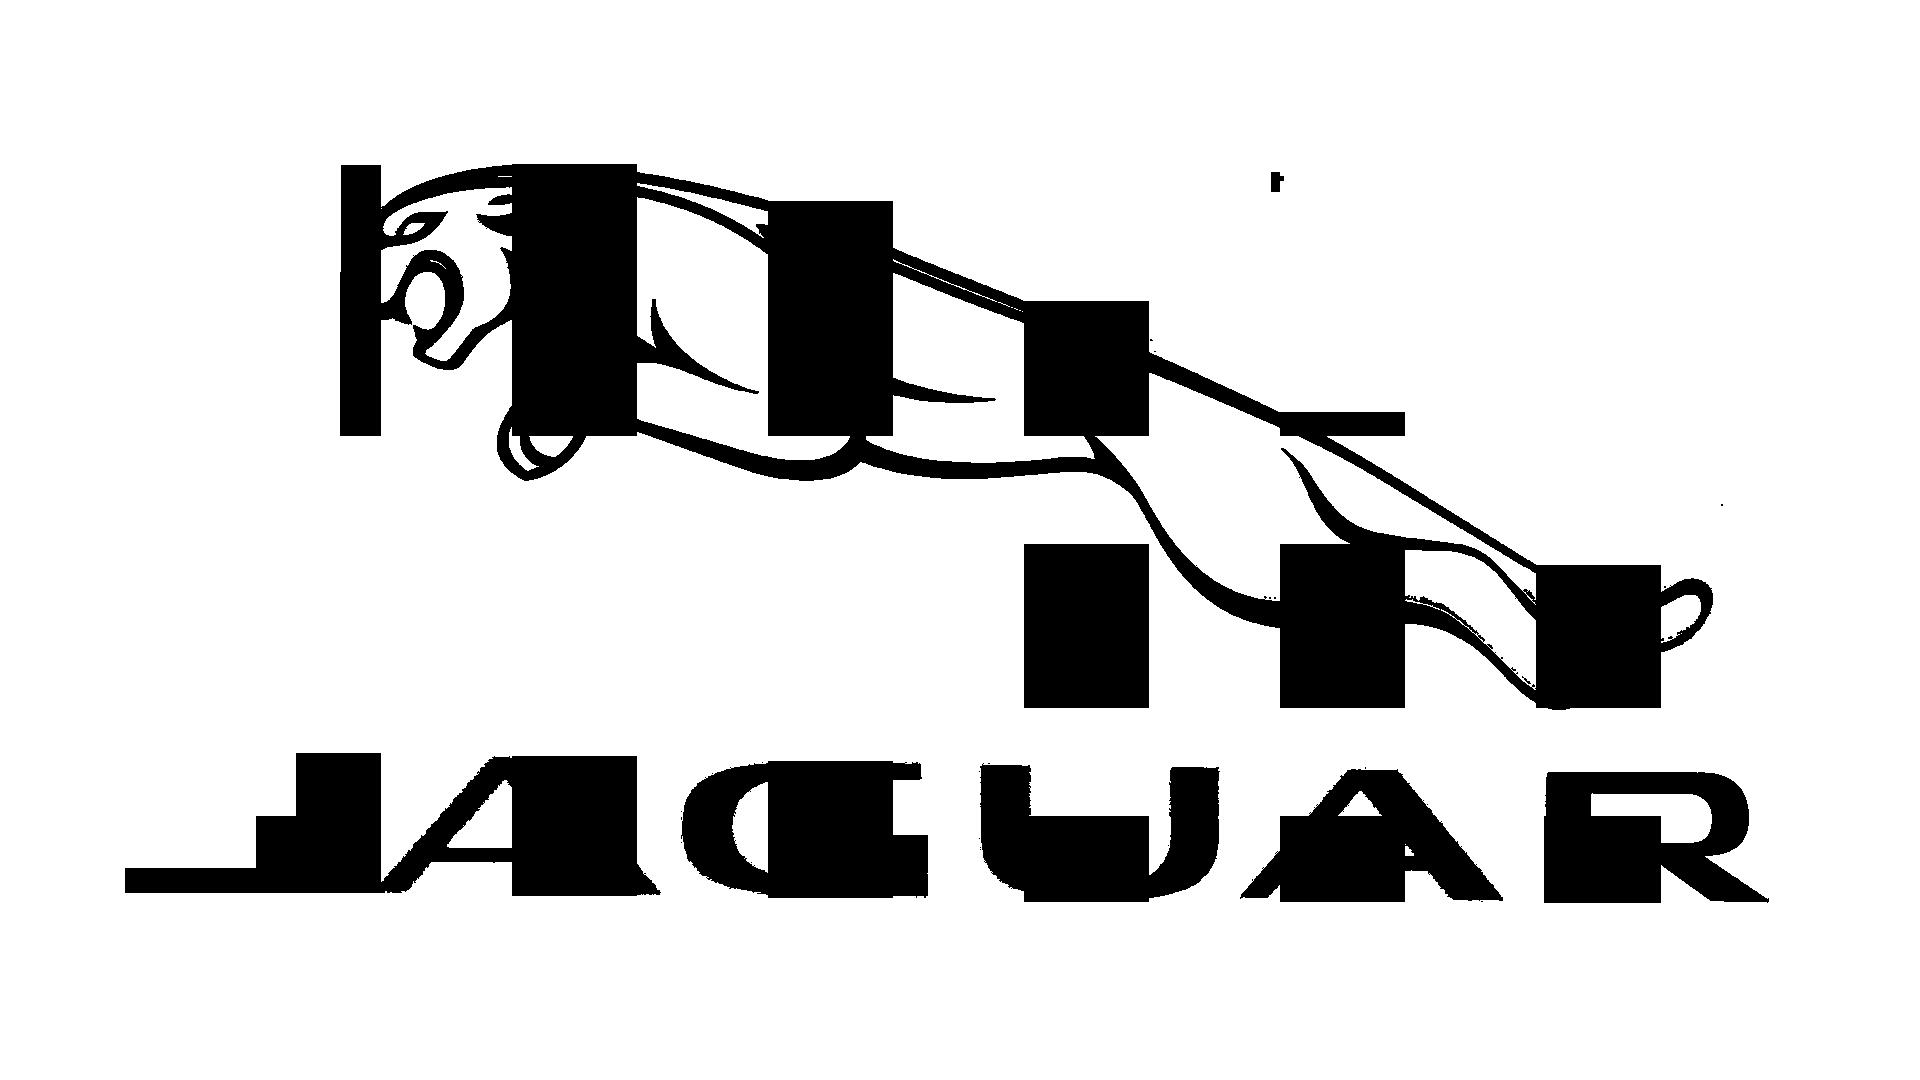 Jaguar Symbol (black) 1920x1080 (HD 1080p) - Jaguar PNG Black And White